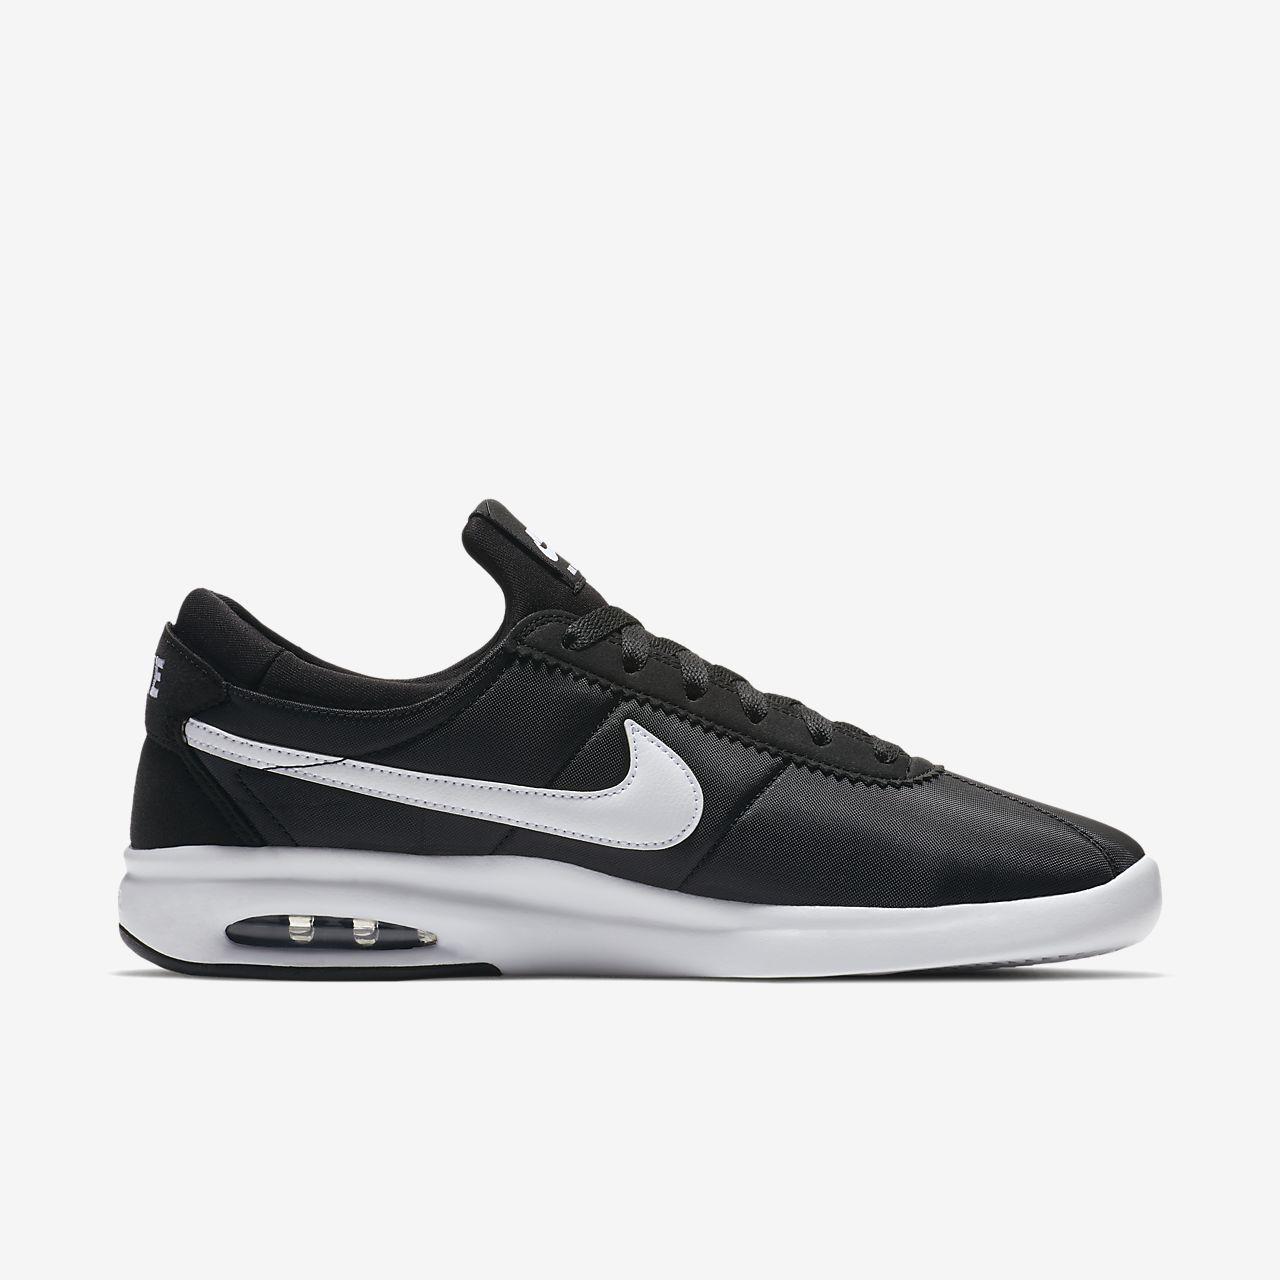 ... Nike SB Air Max Bruin Vapor Men's Skateboarding Shoe